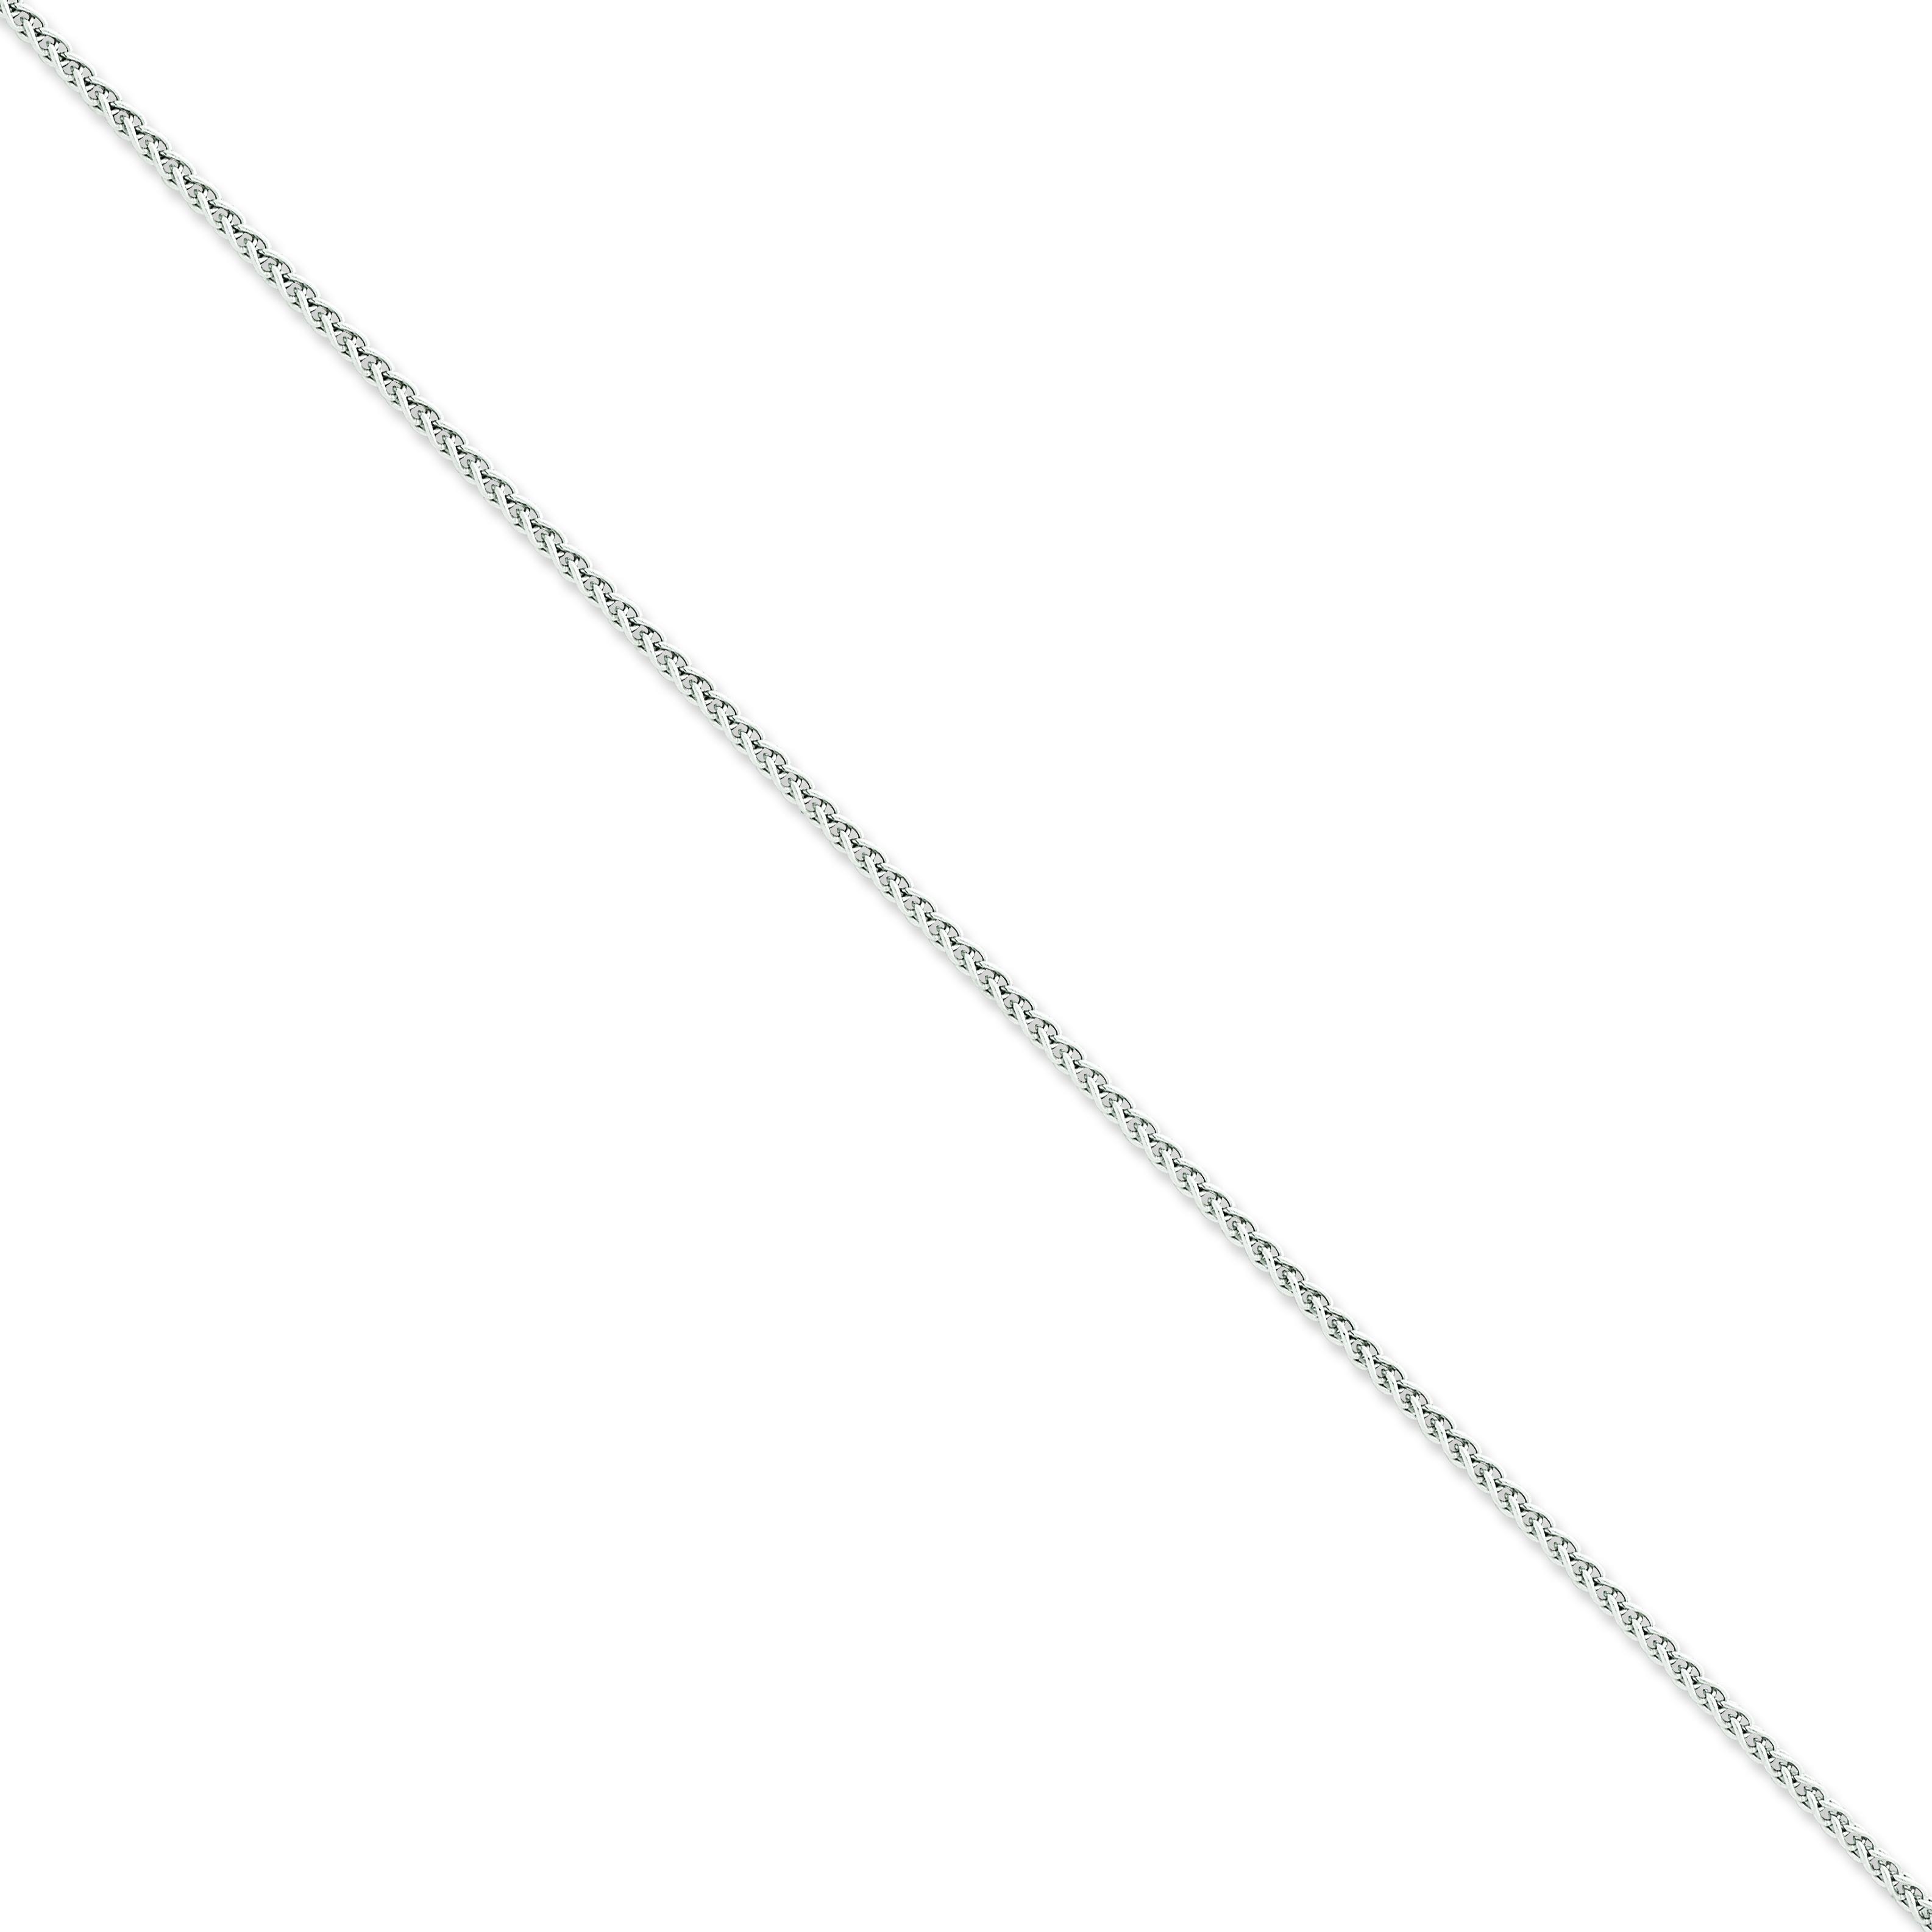 14k White Gold 7 inch 2.25 mm  Spiga Chain Bracelet